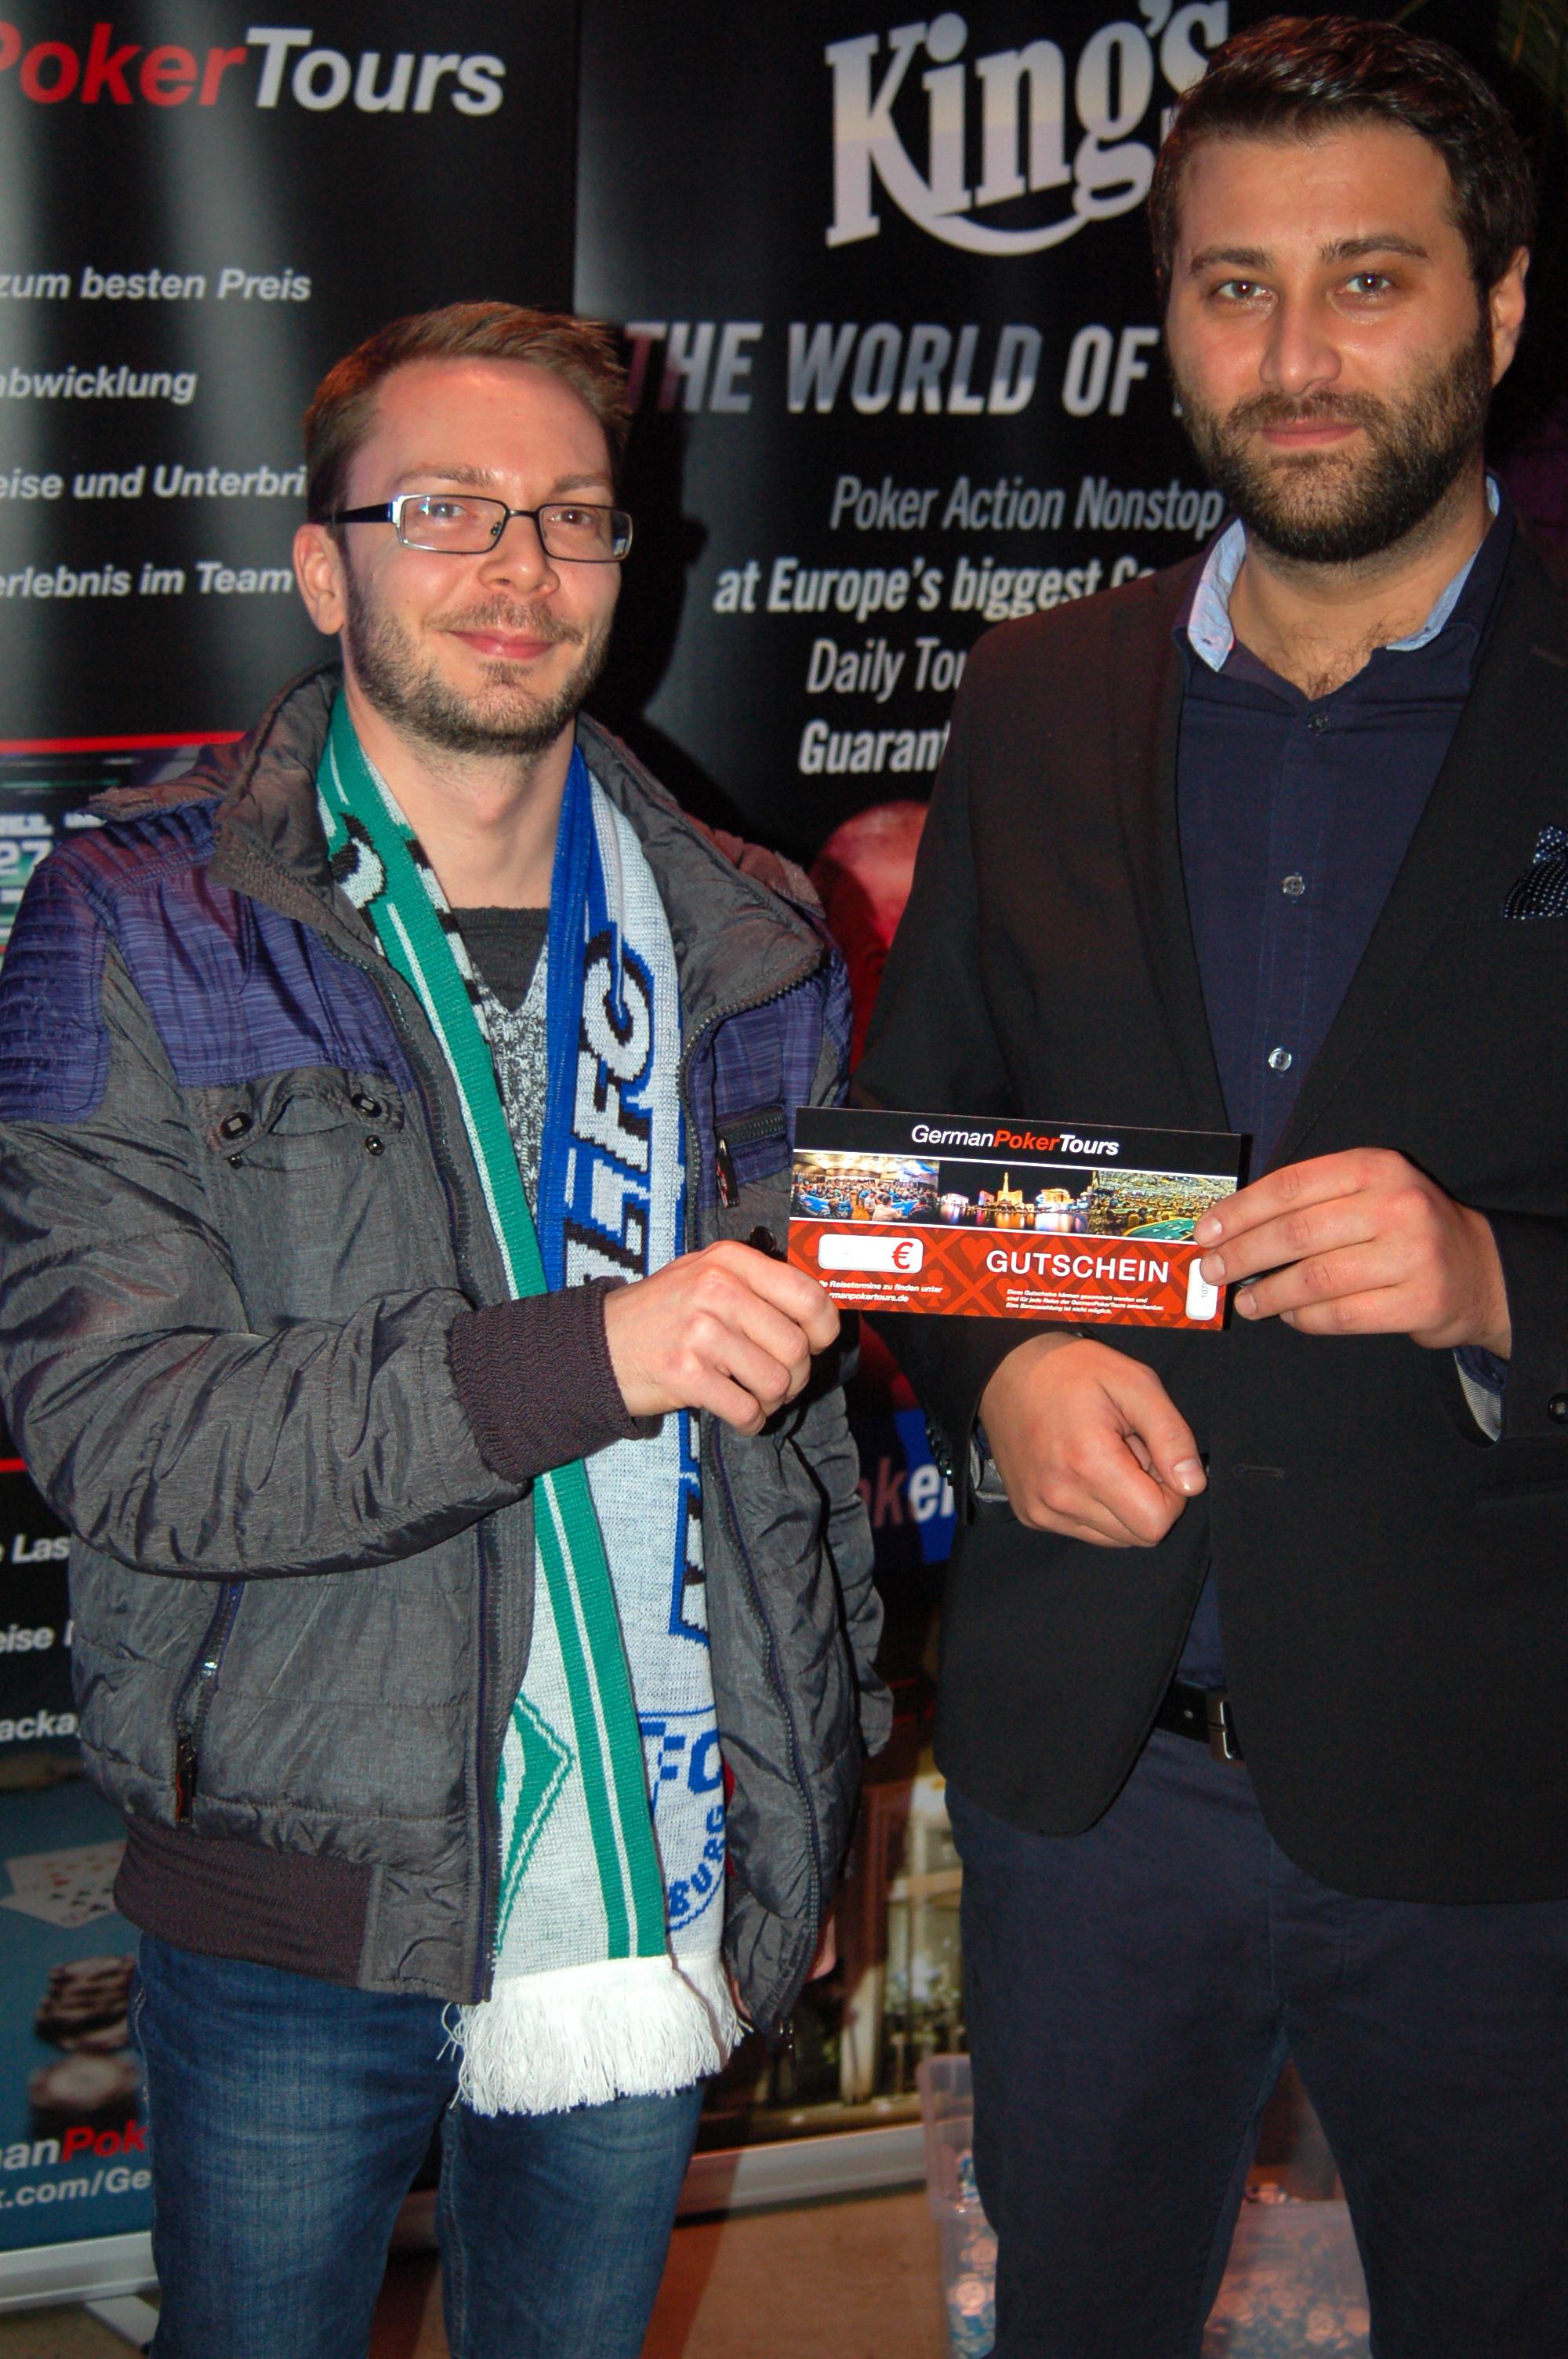 Poker Days Bremen